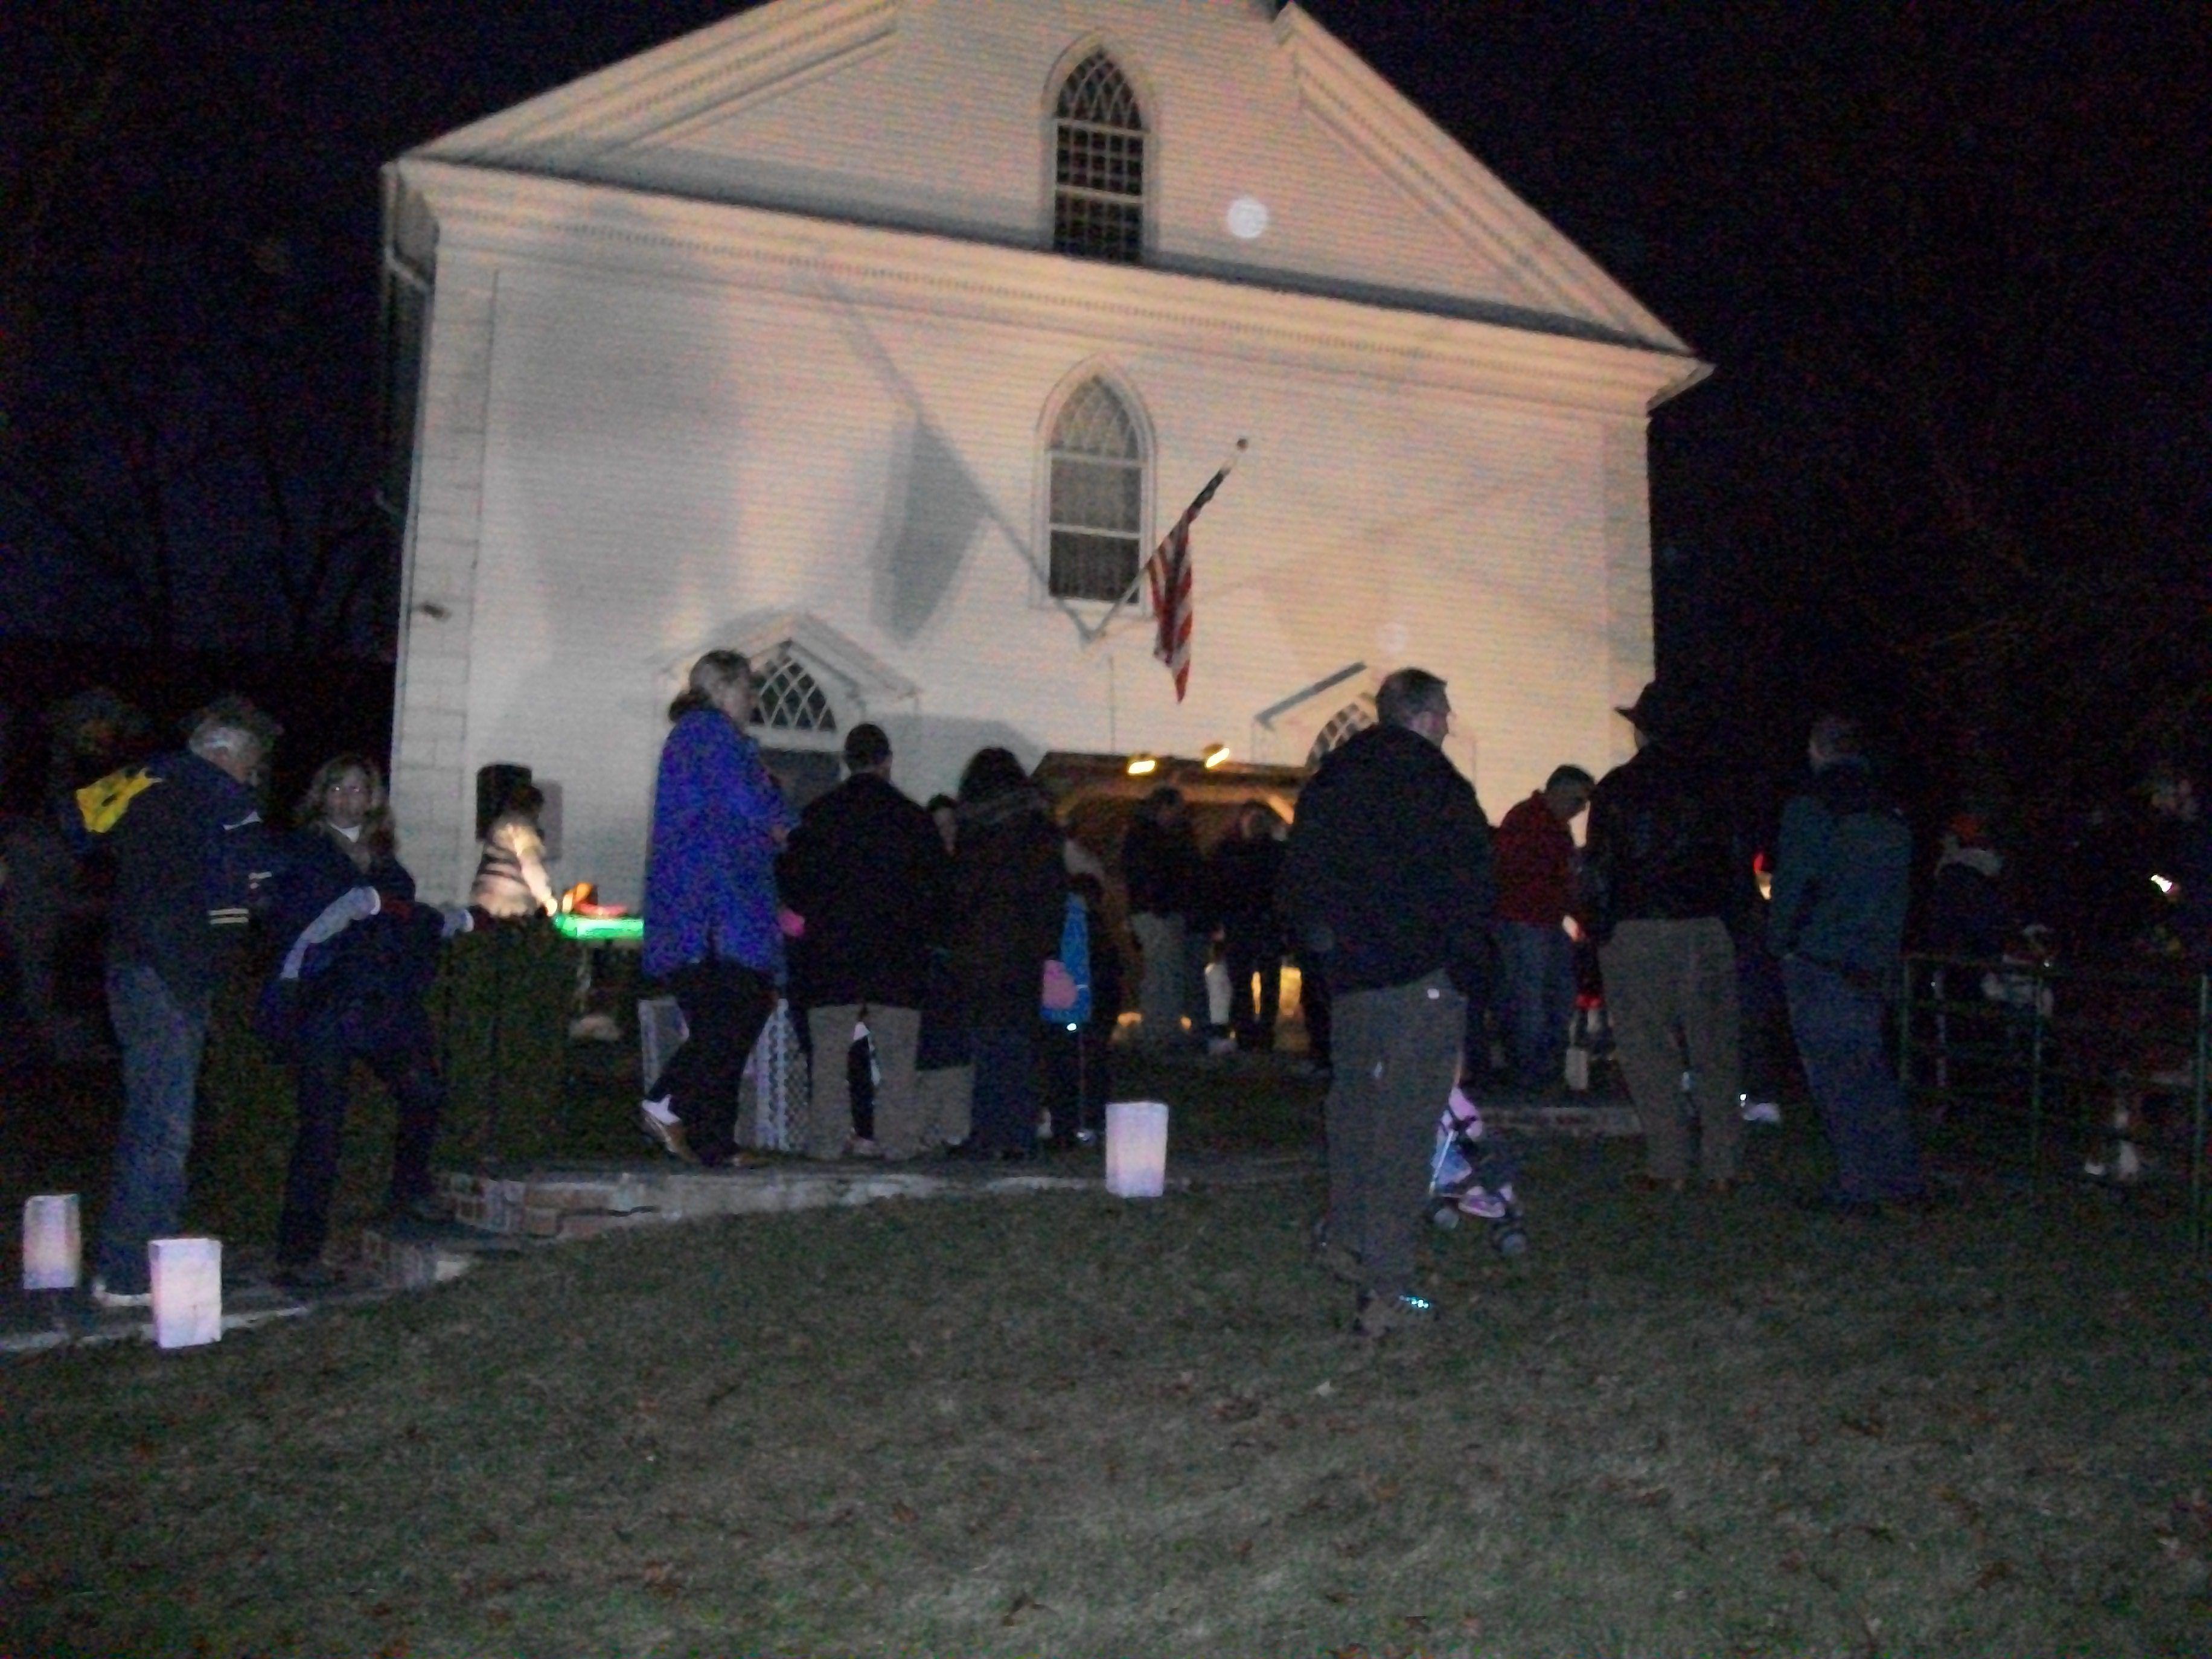 3ca8078b20c8e1c192d5_crowds_at_the_new_providence_presbyterian_church.jpg